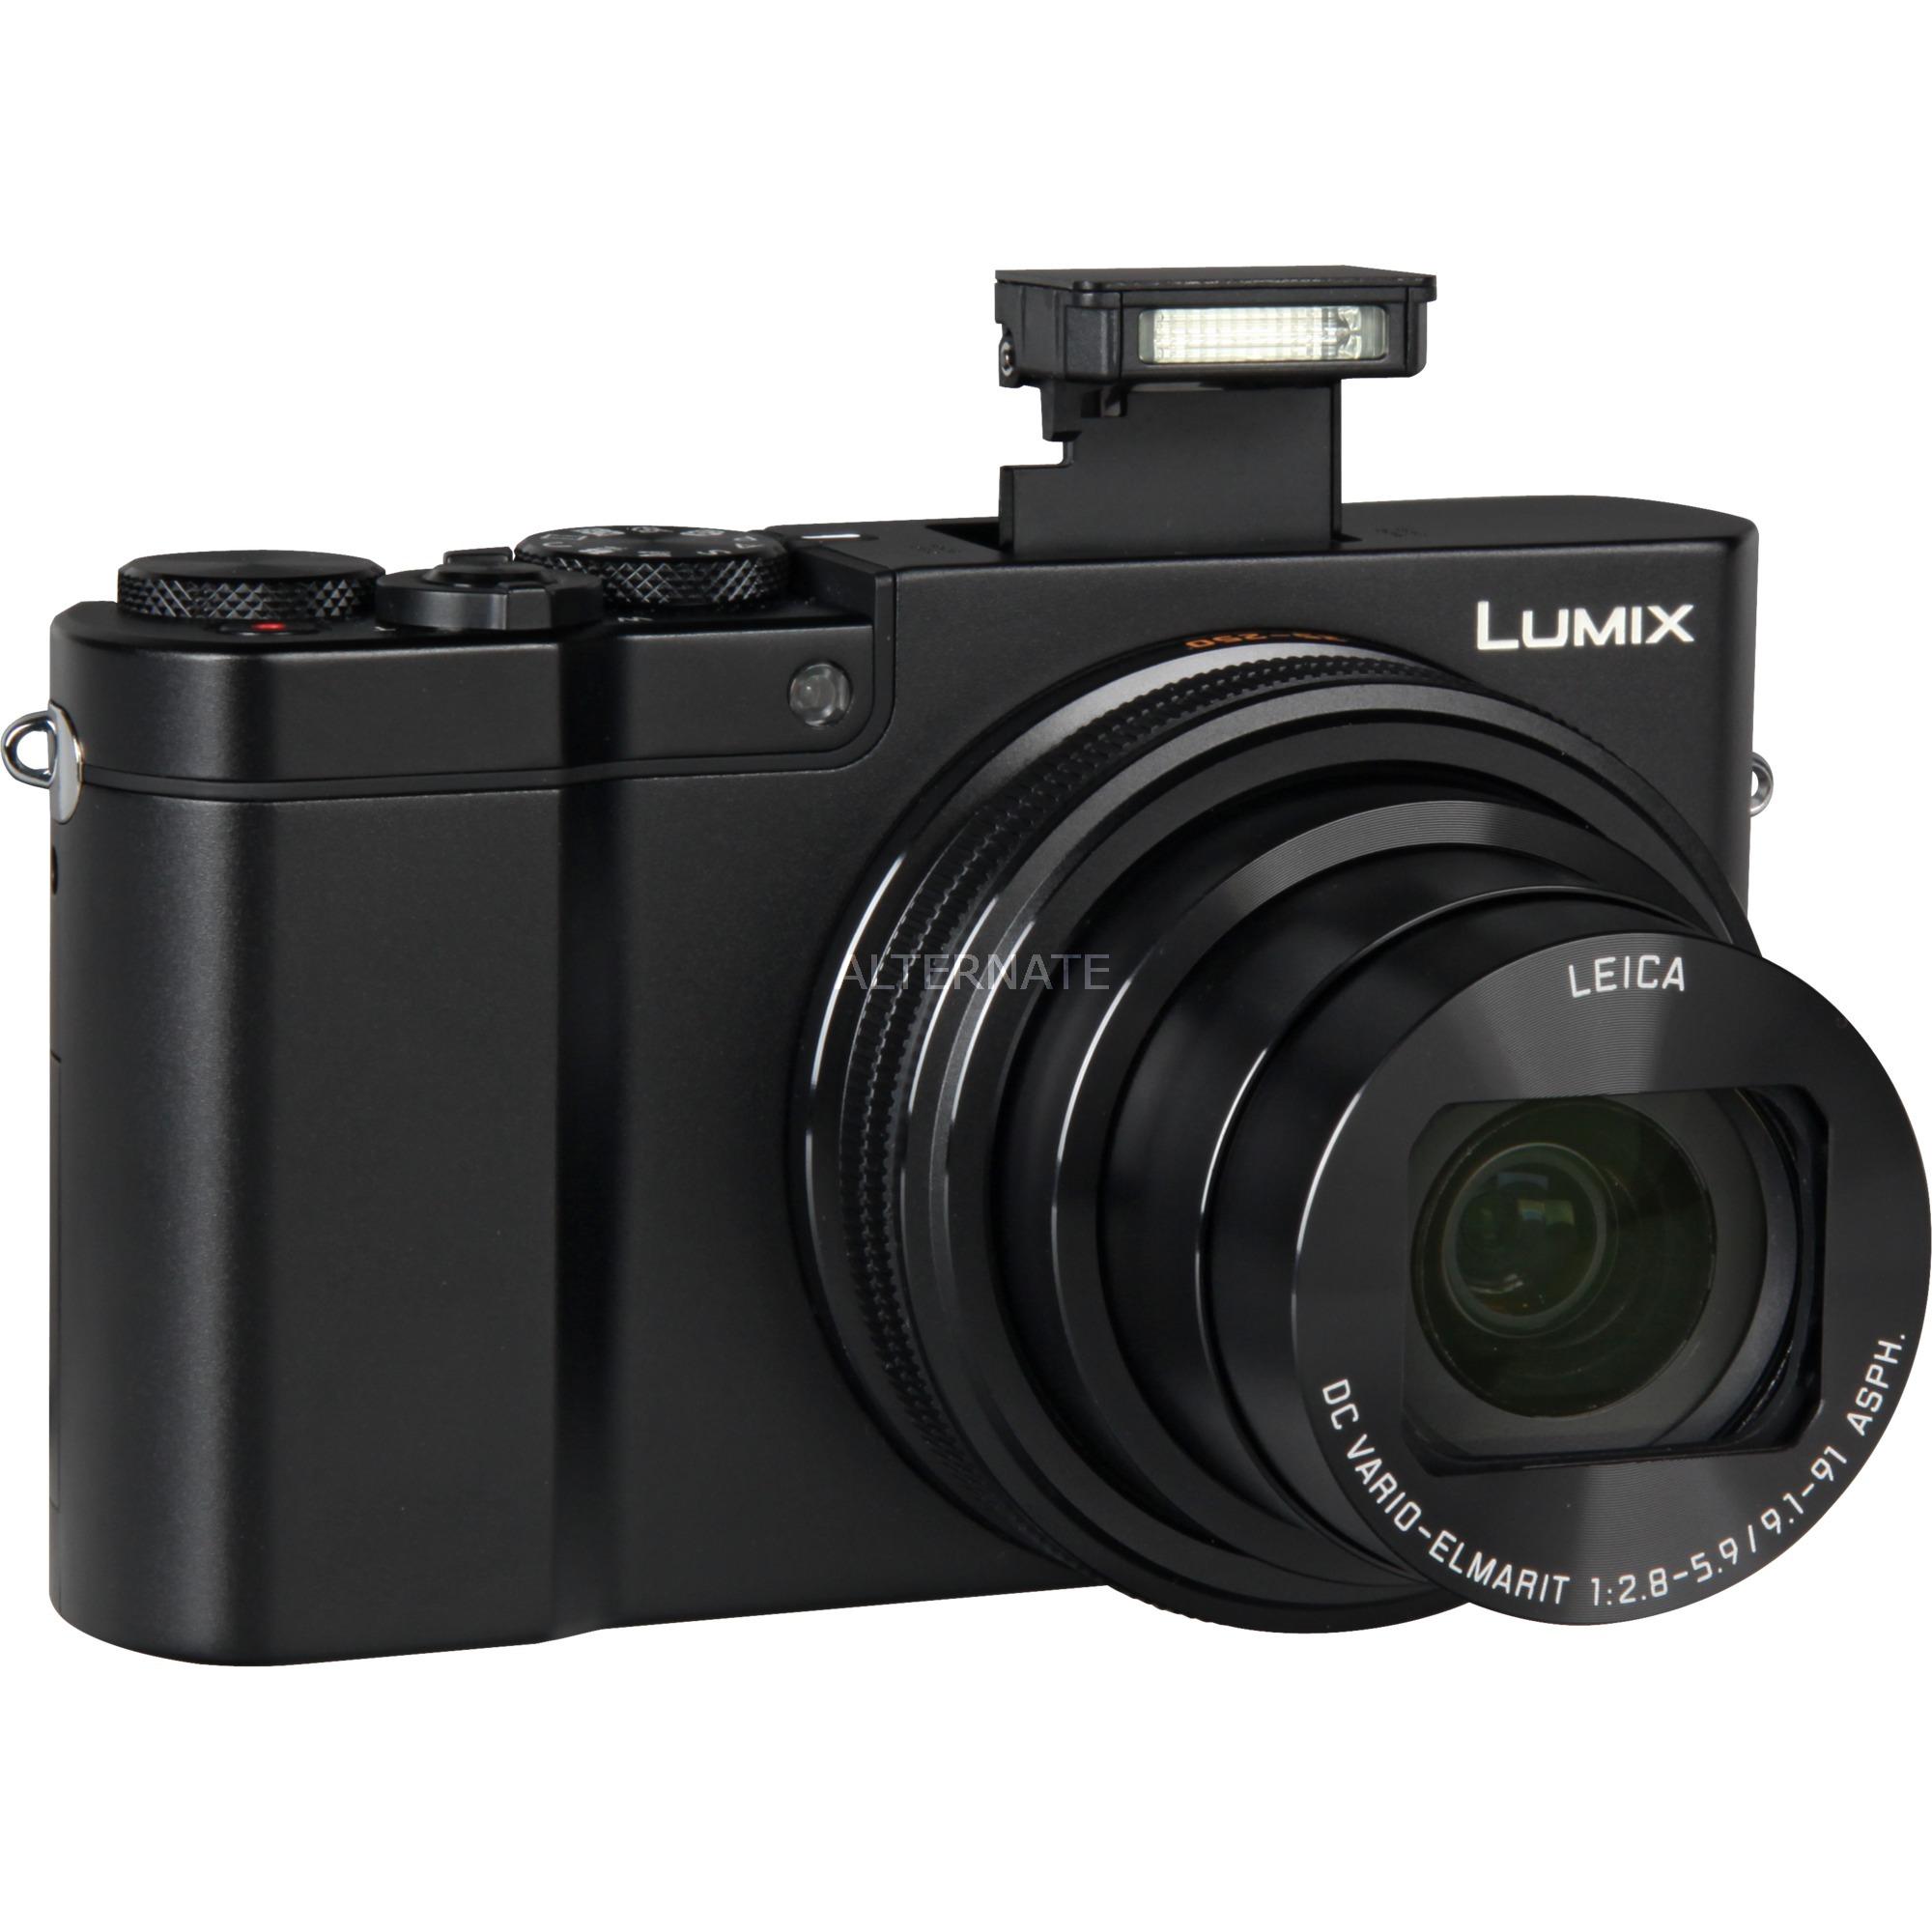 dmc-tz100eg-k-digital-kamera